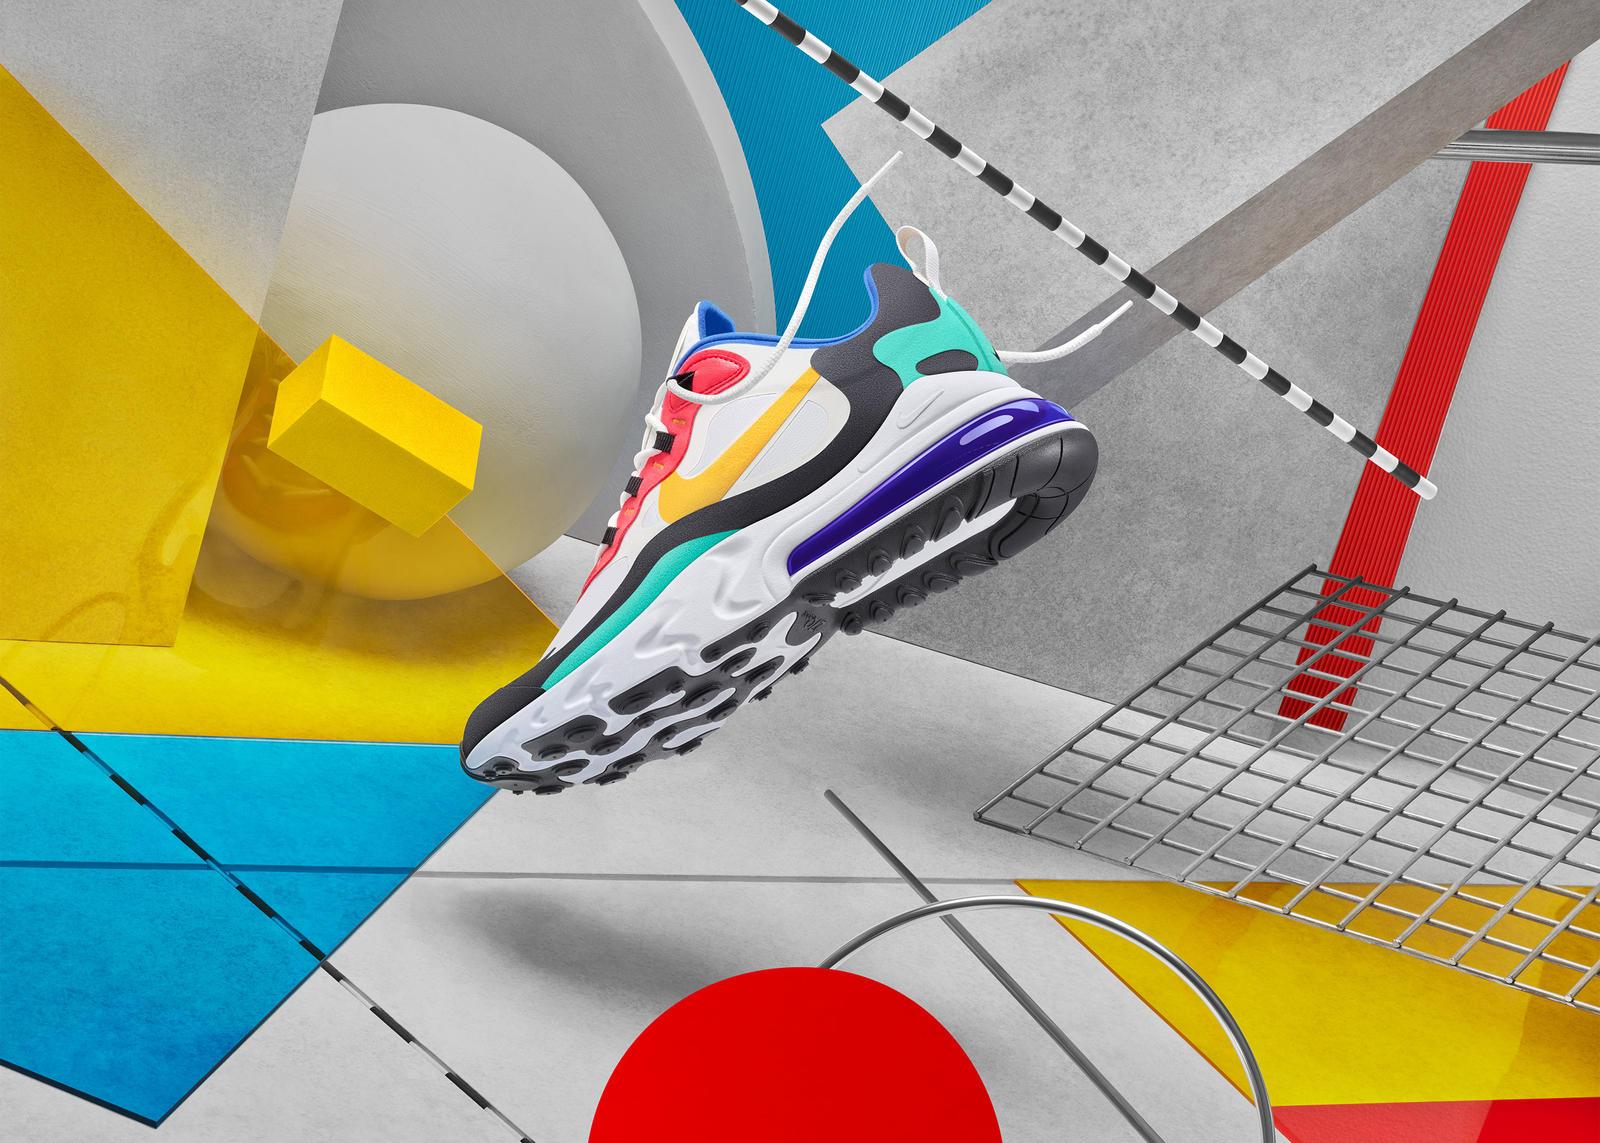 Introducing: the Nike Air Max 270 React